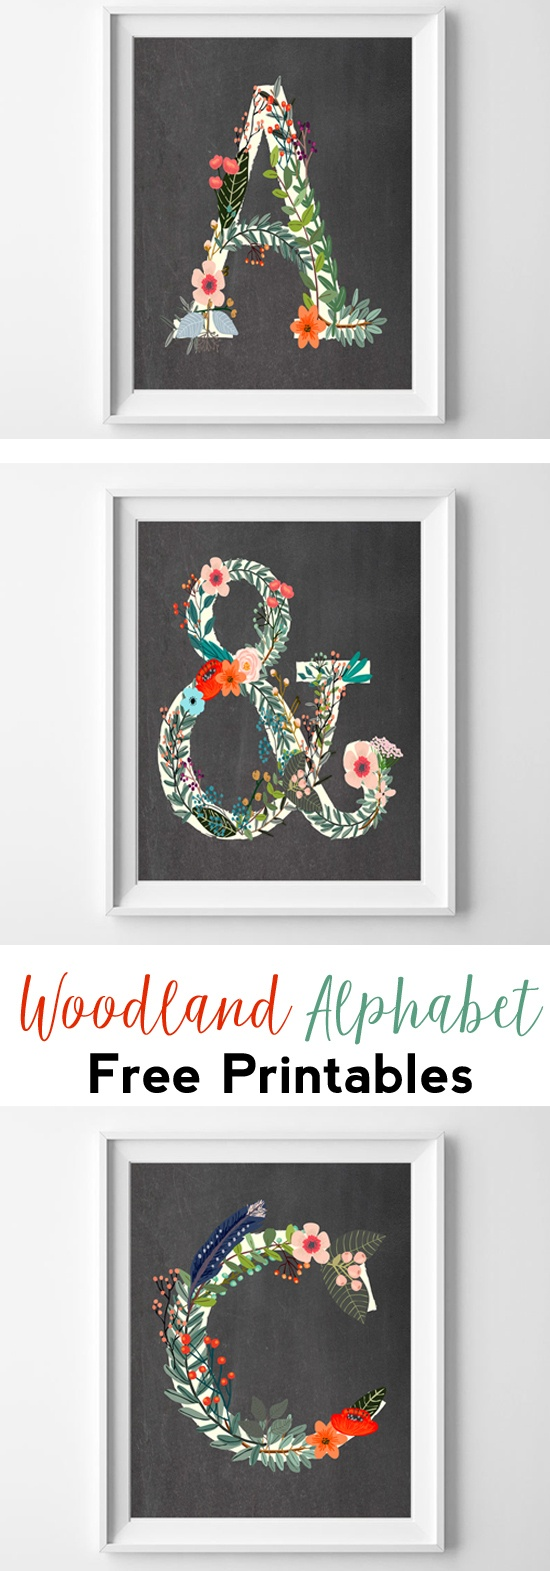 Letter Art {Woodland Alphabet Free Printables} - All Crafty Things - Free Printable Photo Letter Art